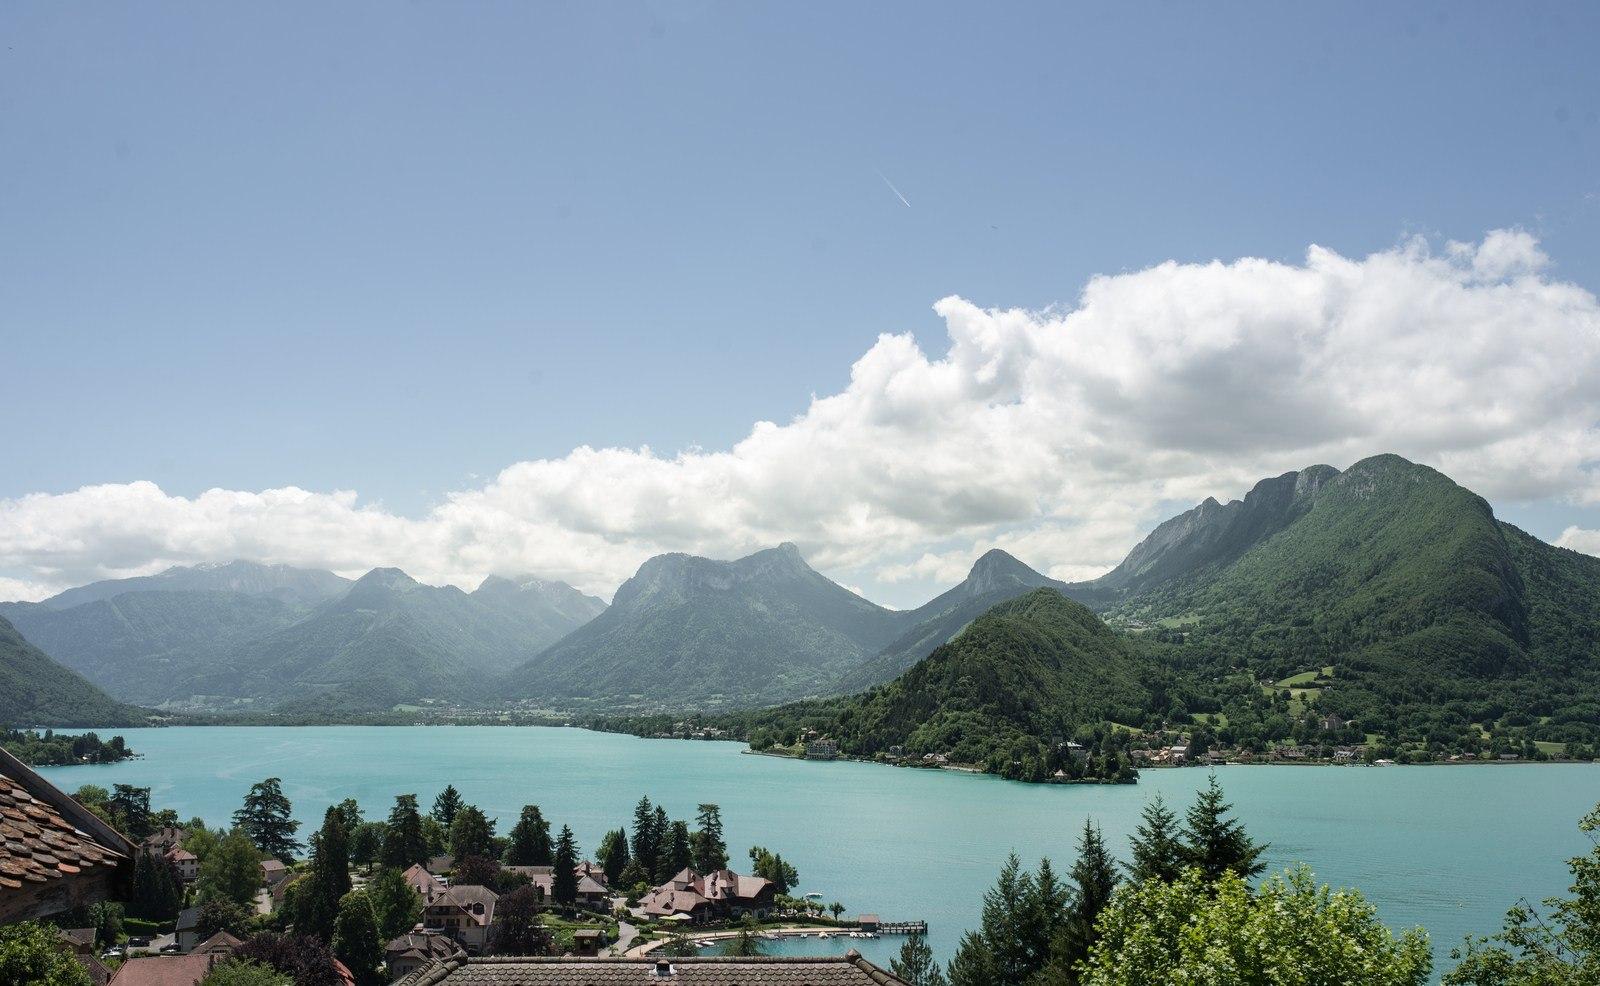 Le lac d'Annecy Annecy